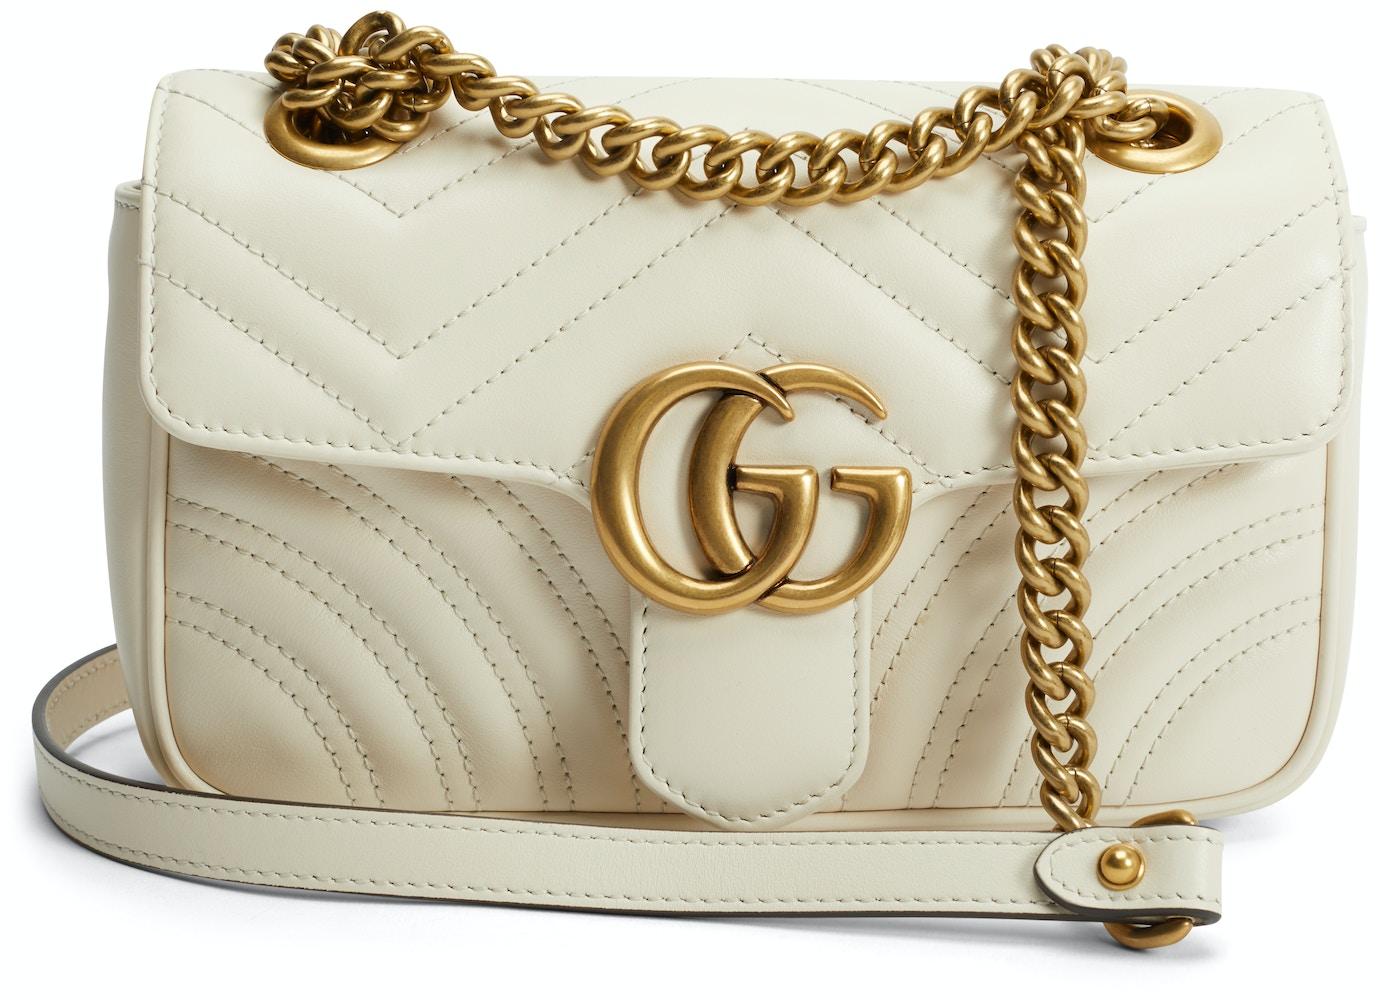 855fb1bfc138cd Gucci Shoulder Bag Marmont Matelasse Mini White. Matelasse Mini White